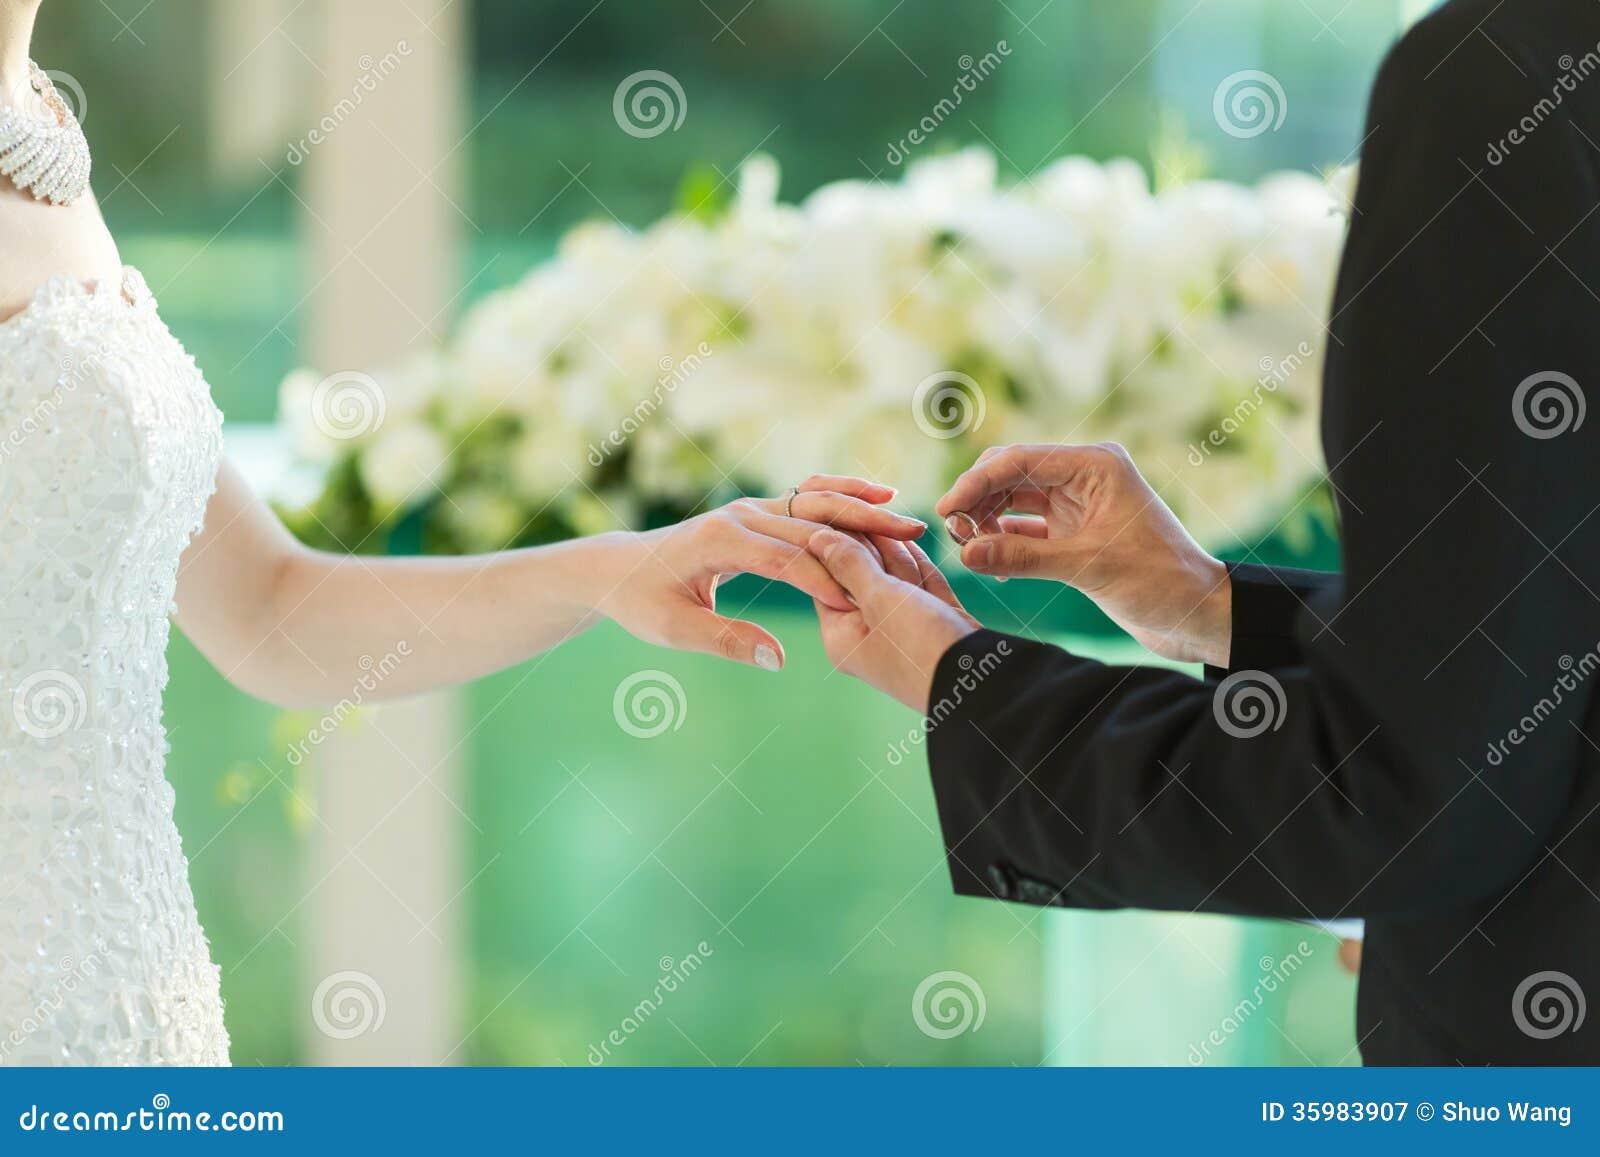 wedding ring royalty free stock photography image 35983907